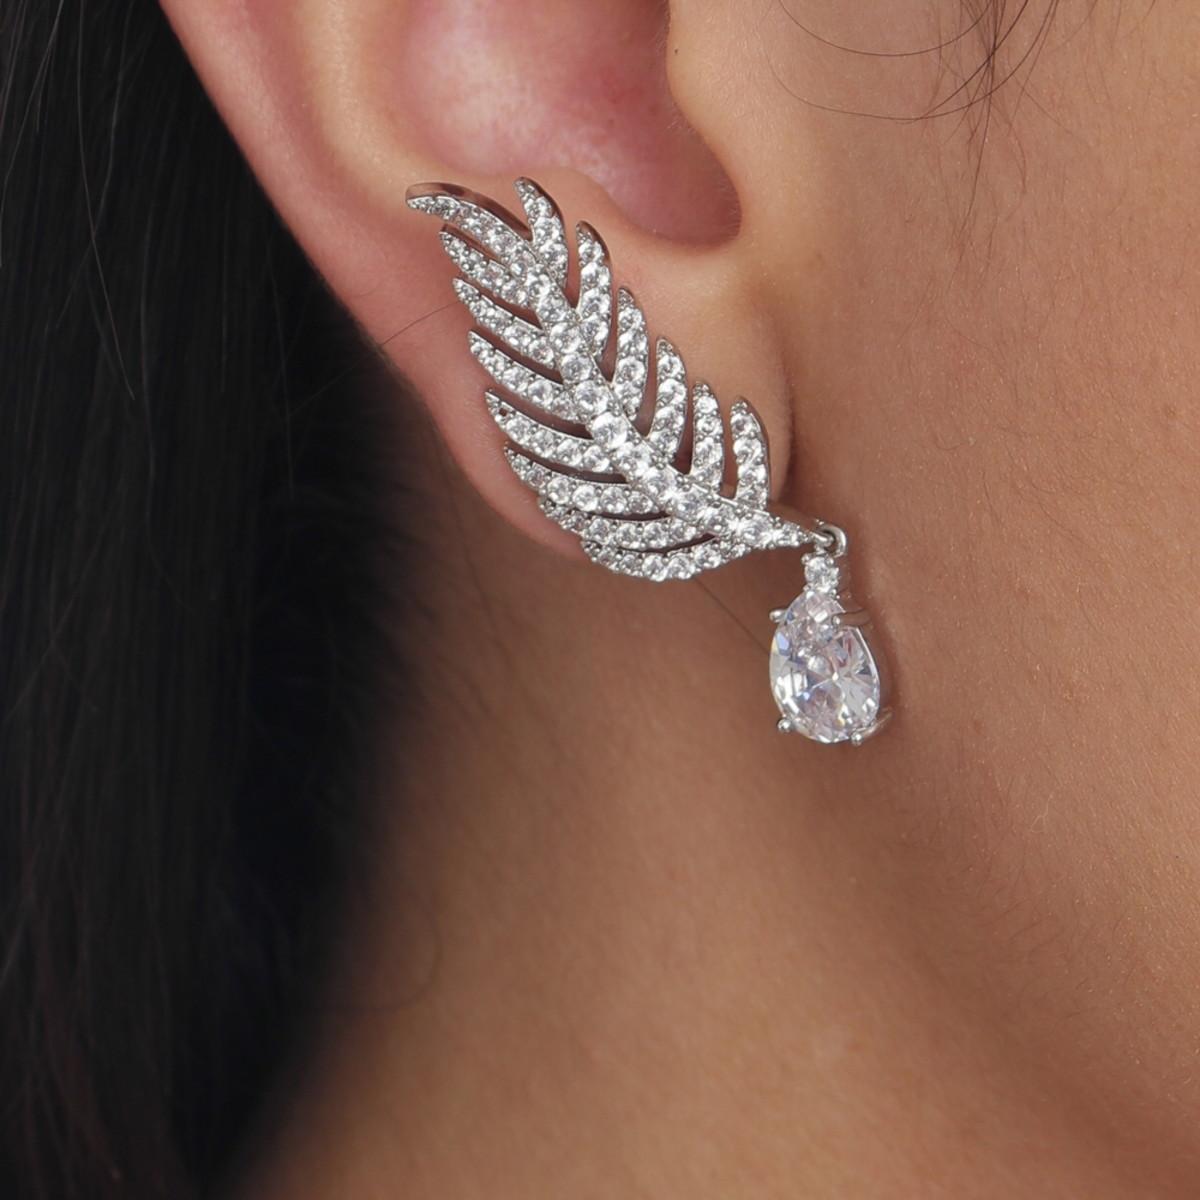 e71038cbc89af Brinco Ear Cuff Folhas Cristal Semi Joia Luxo no Elo7   Drusi Semi ...